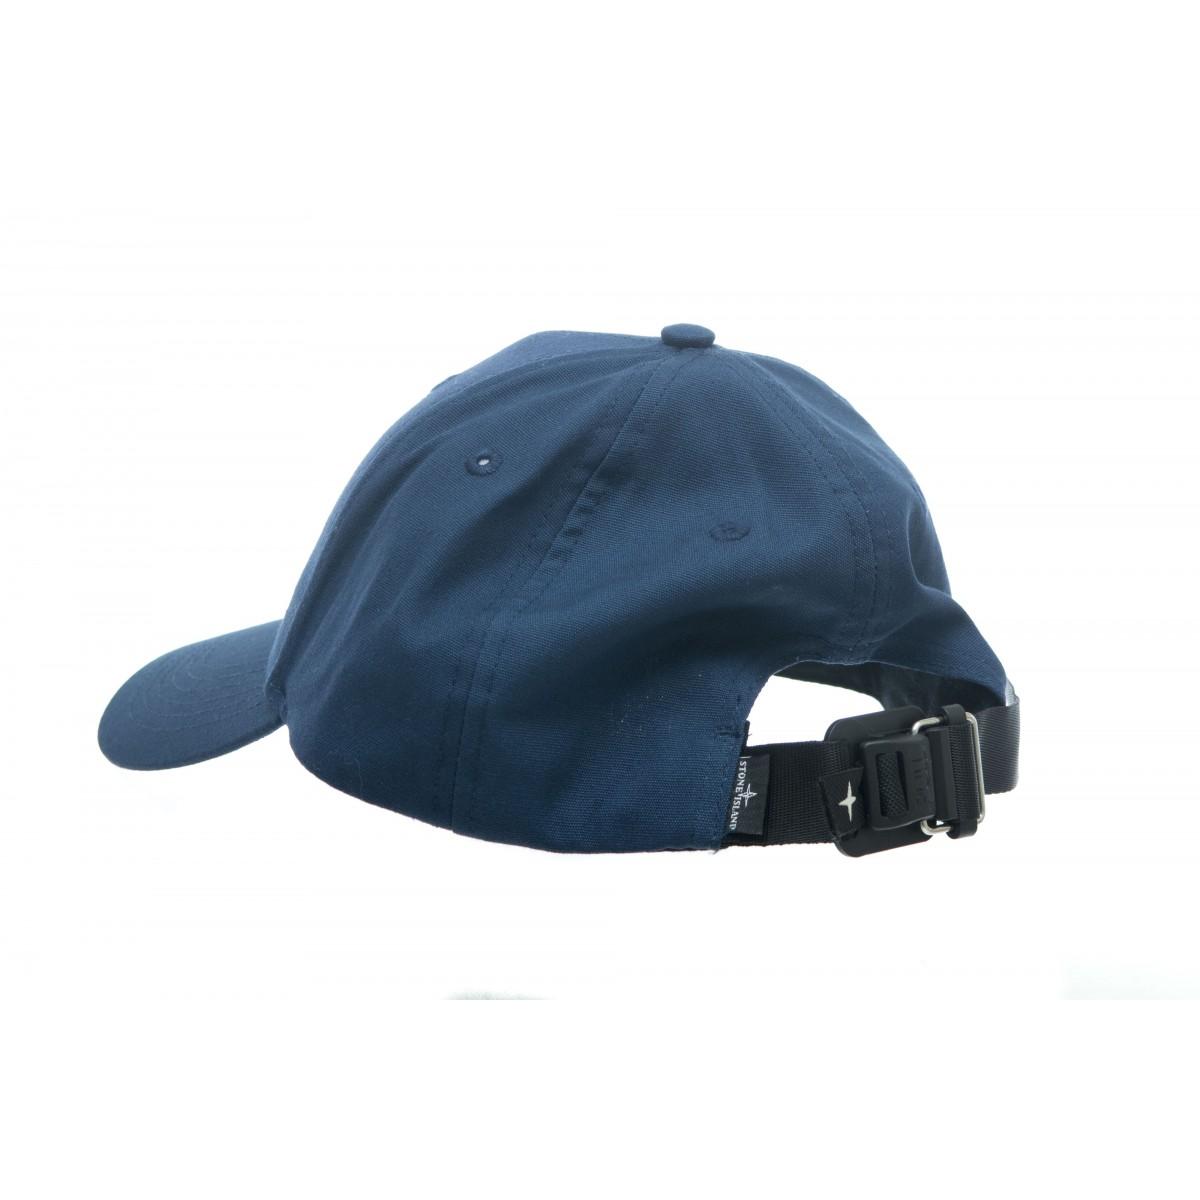 Berretto - 99168 cappellino visiera